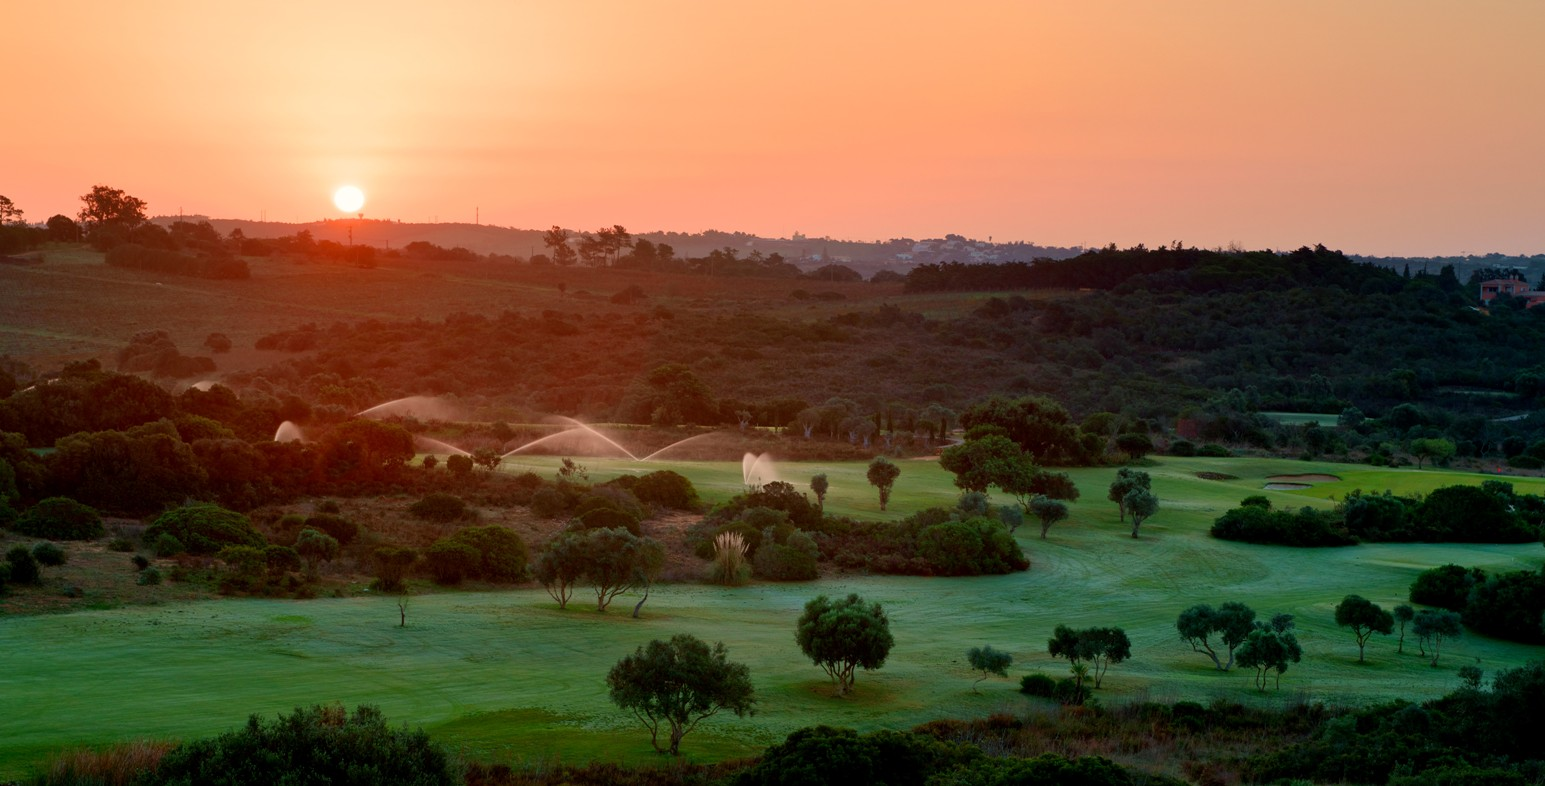 Espiche Golf_Sunset over #5 and #6_D823904 web.jpg